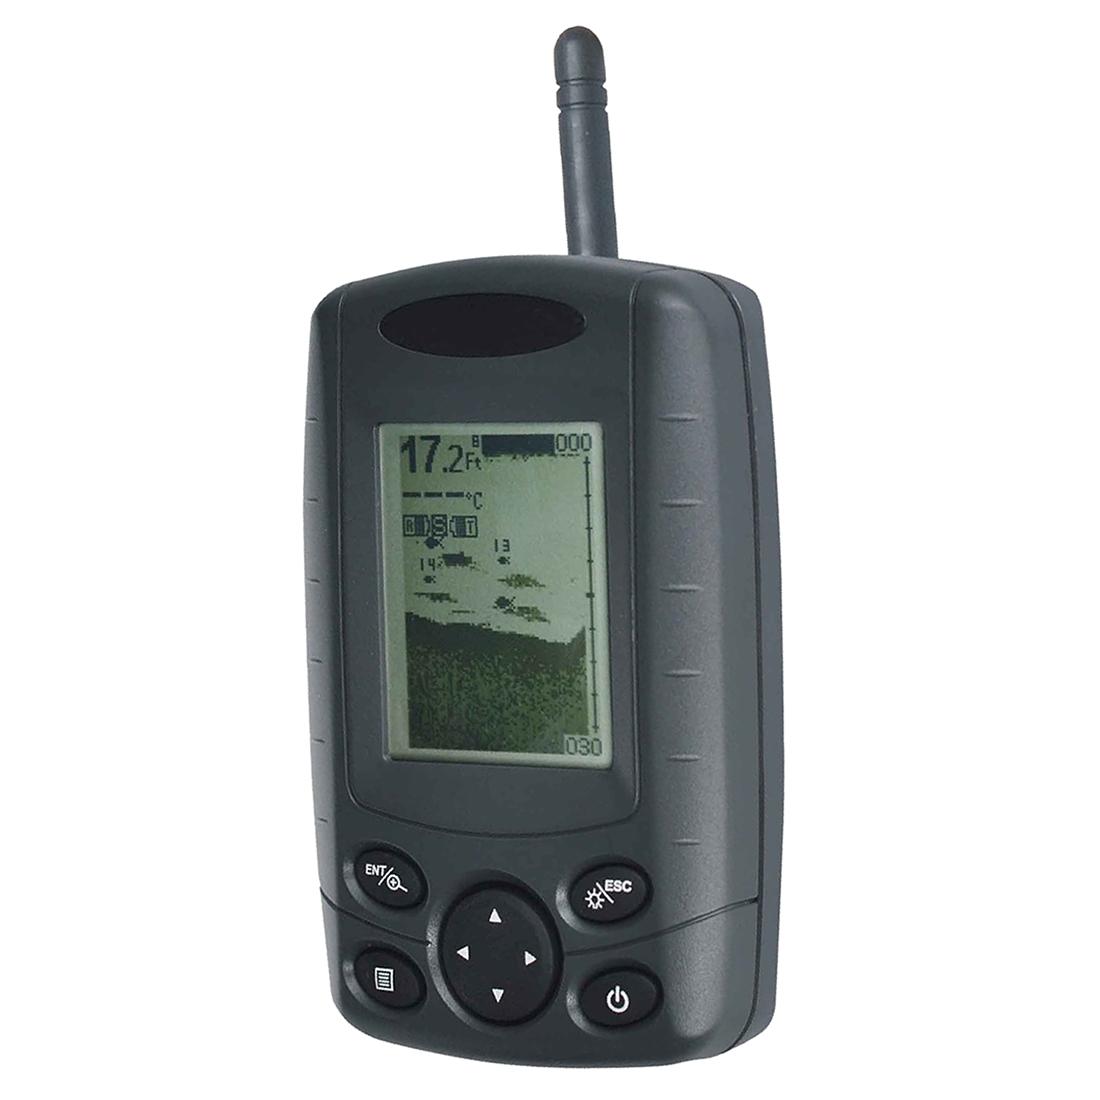 69.62$  Buy now - http://alitxj.worldwells.pw/go.php?t=32751909571 - ELOS-FF-002 Wireless Portable Handheld Fish Finder FishFinder With Round Sonar Sensor (Transducer) White LED Backlight 69.62$